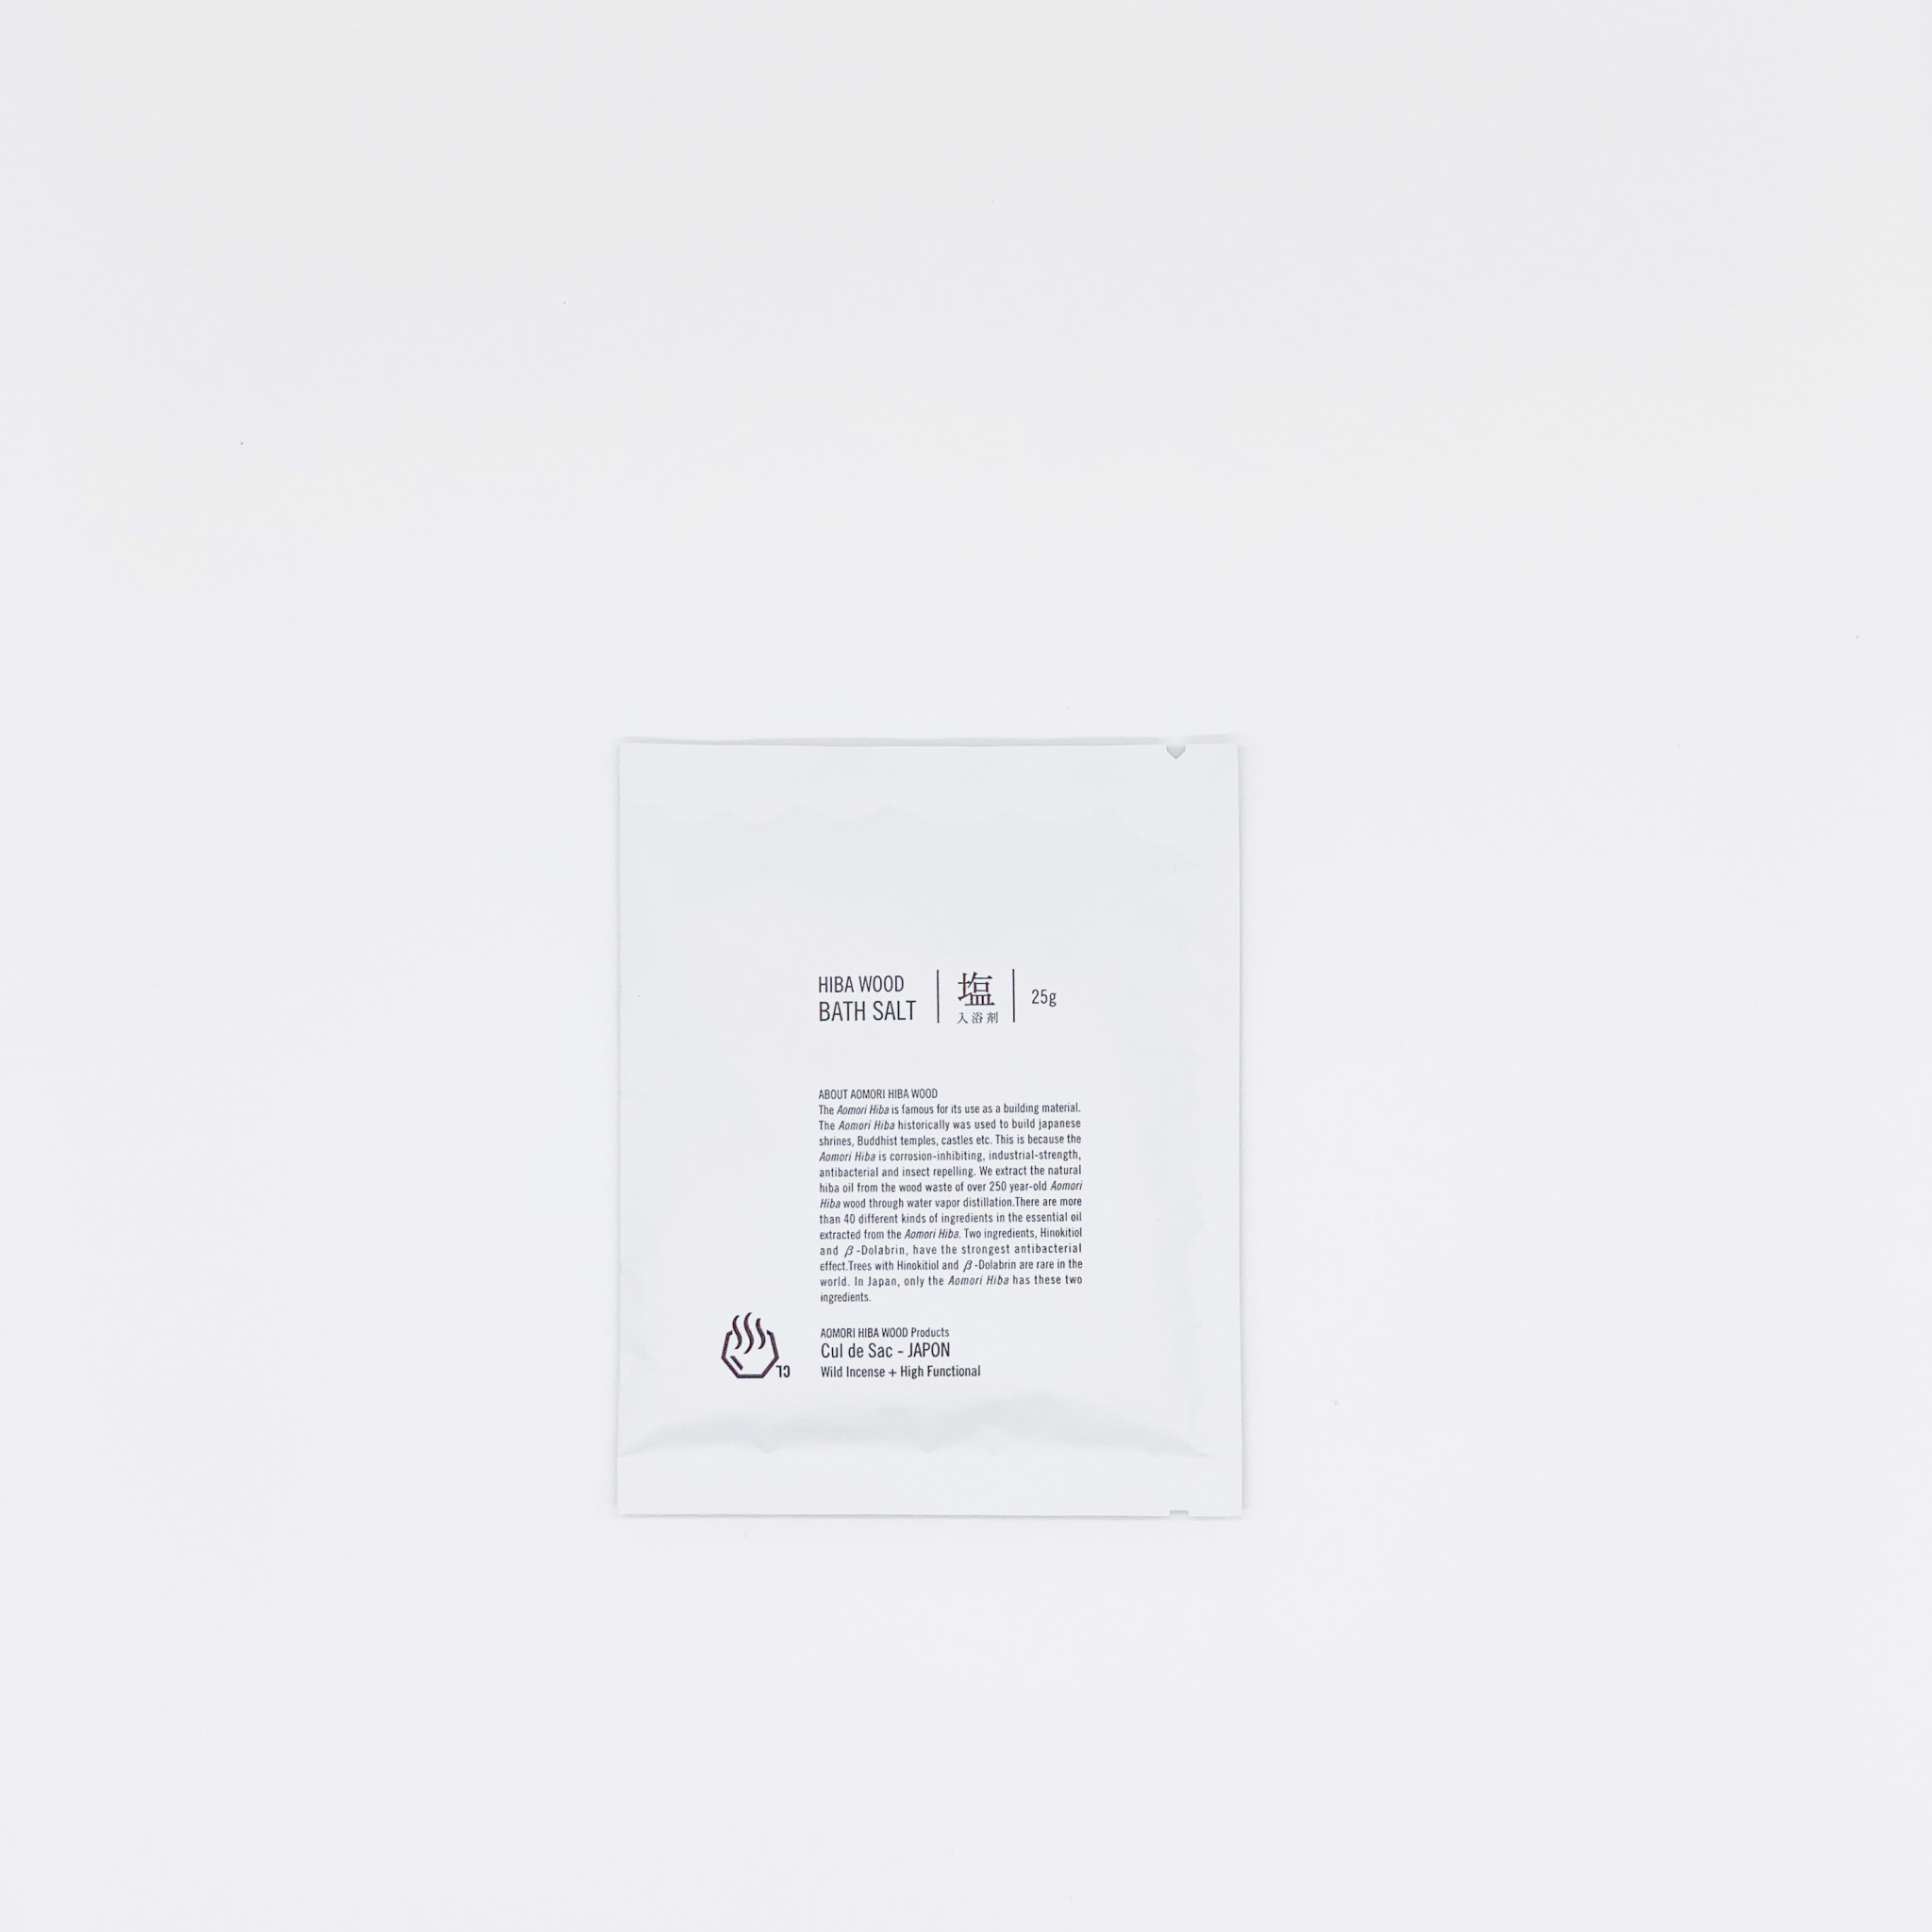 Cul de Sac Cul de Sac - Hiba Wood Bath Salt, 25g